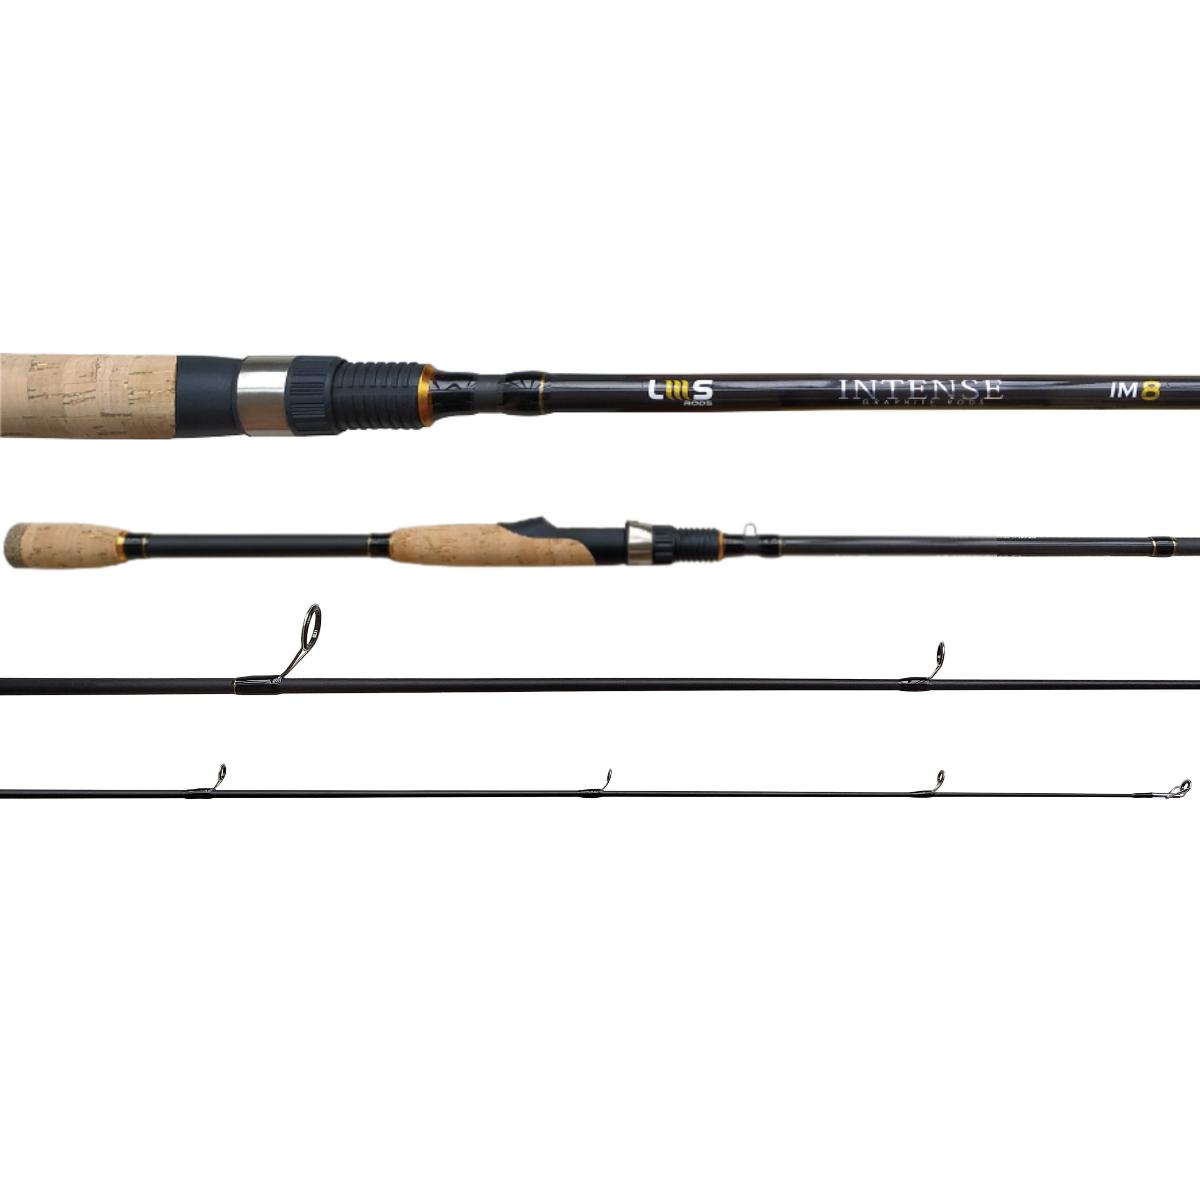 Vara Lumis Intense 631 (1,89m) 5-14Lb Para Molinete Inteiriça  - Pesca Adventure